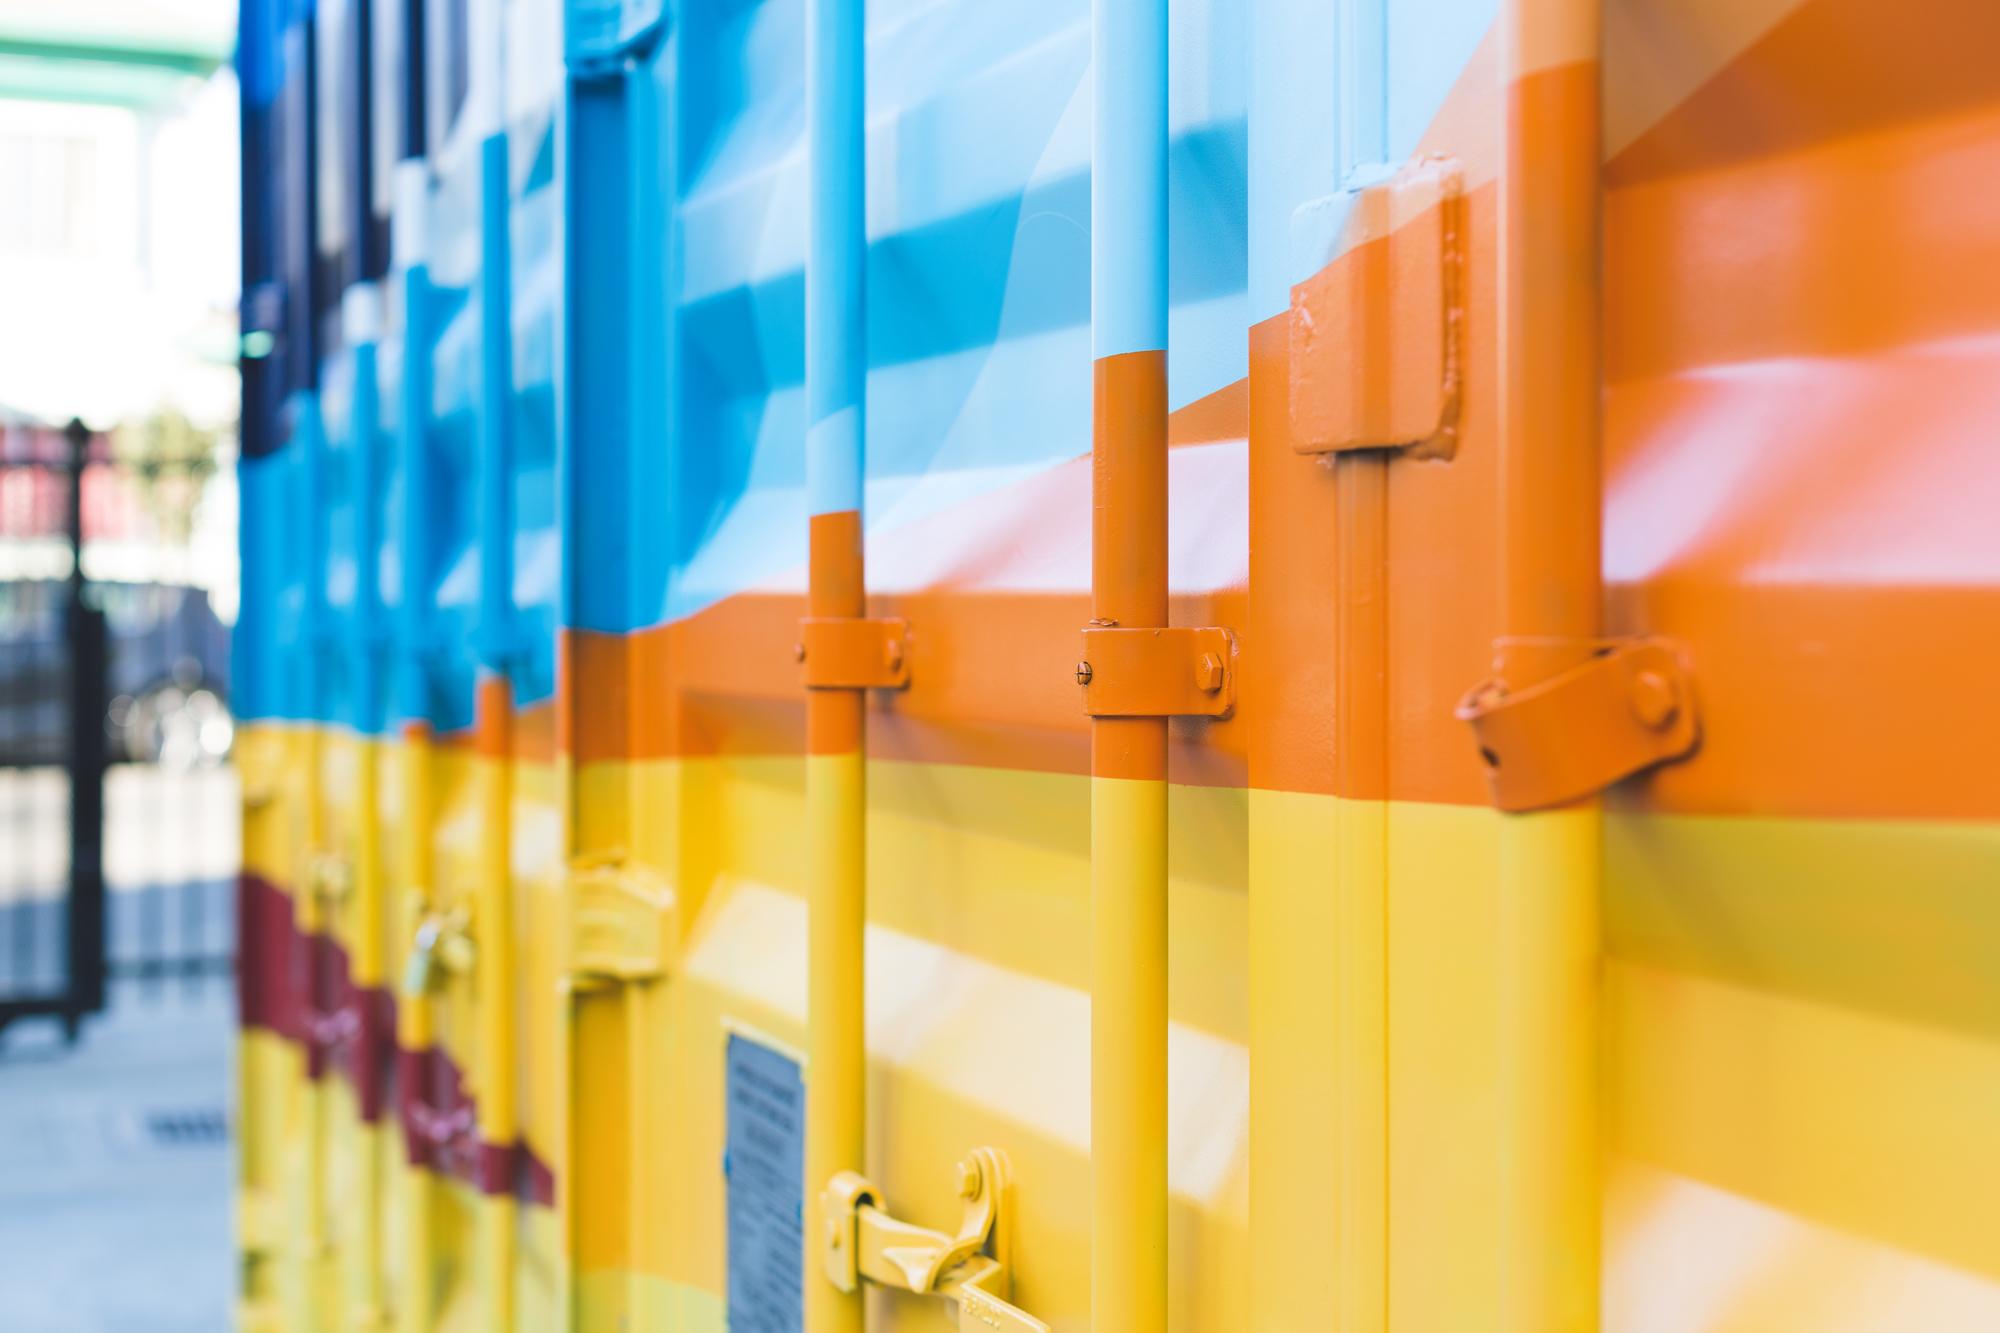 Charlie_Edmiston_Storage_Containers_3.jpg